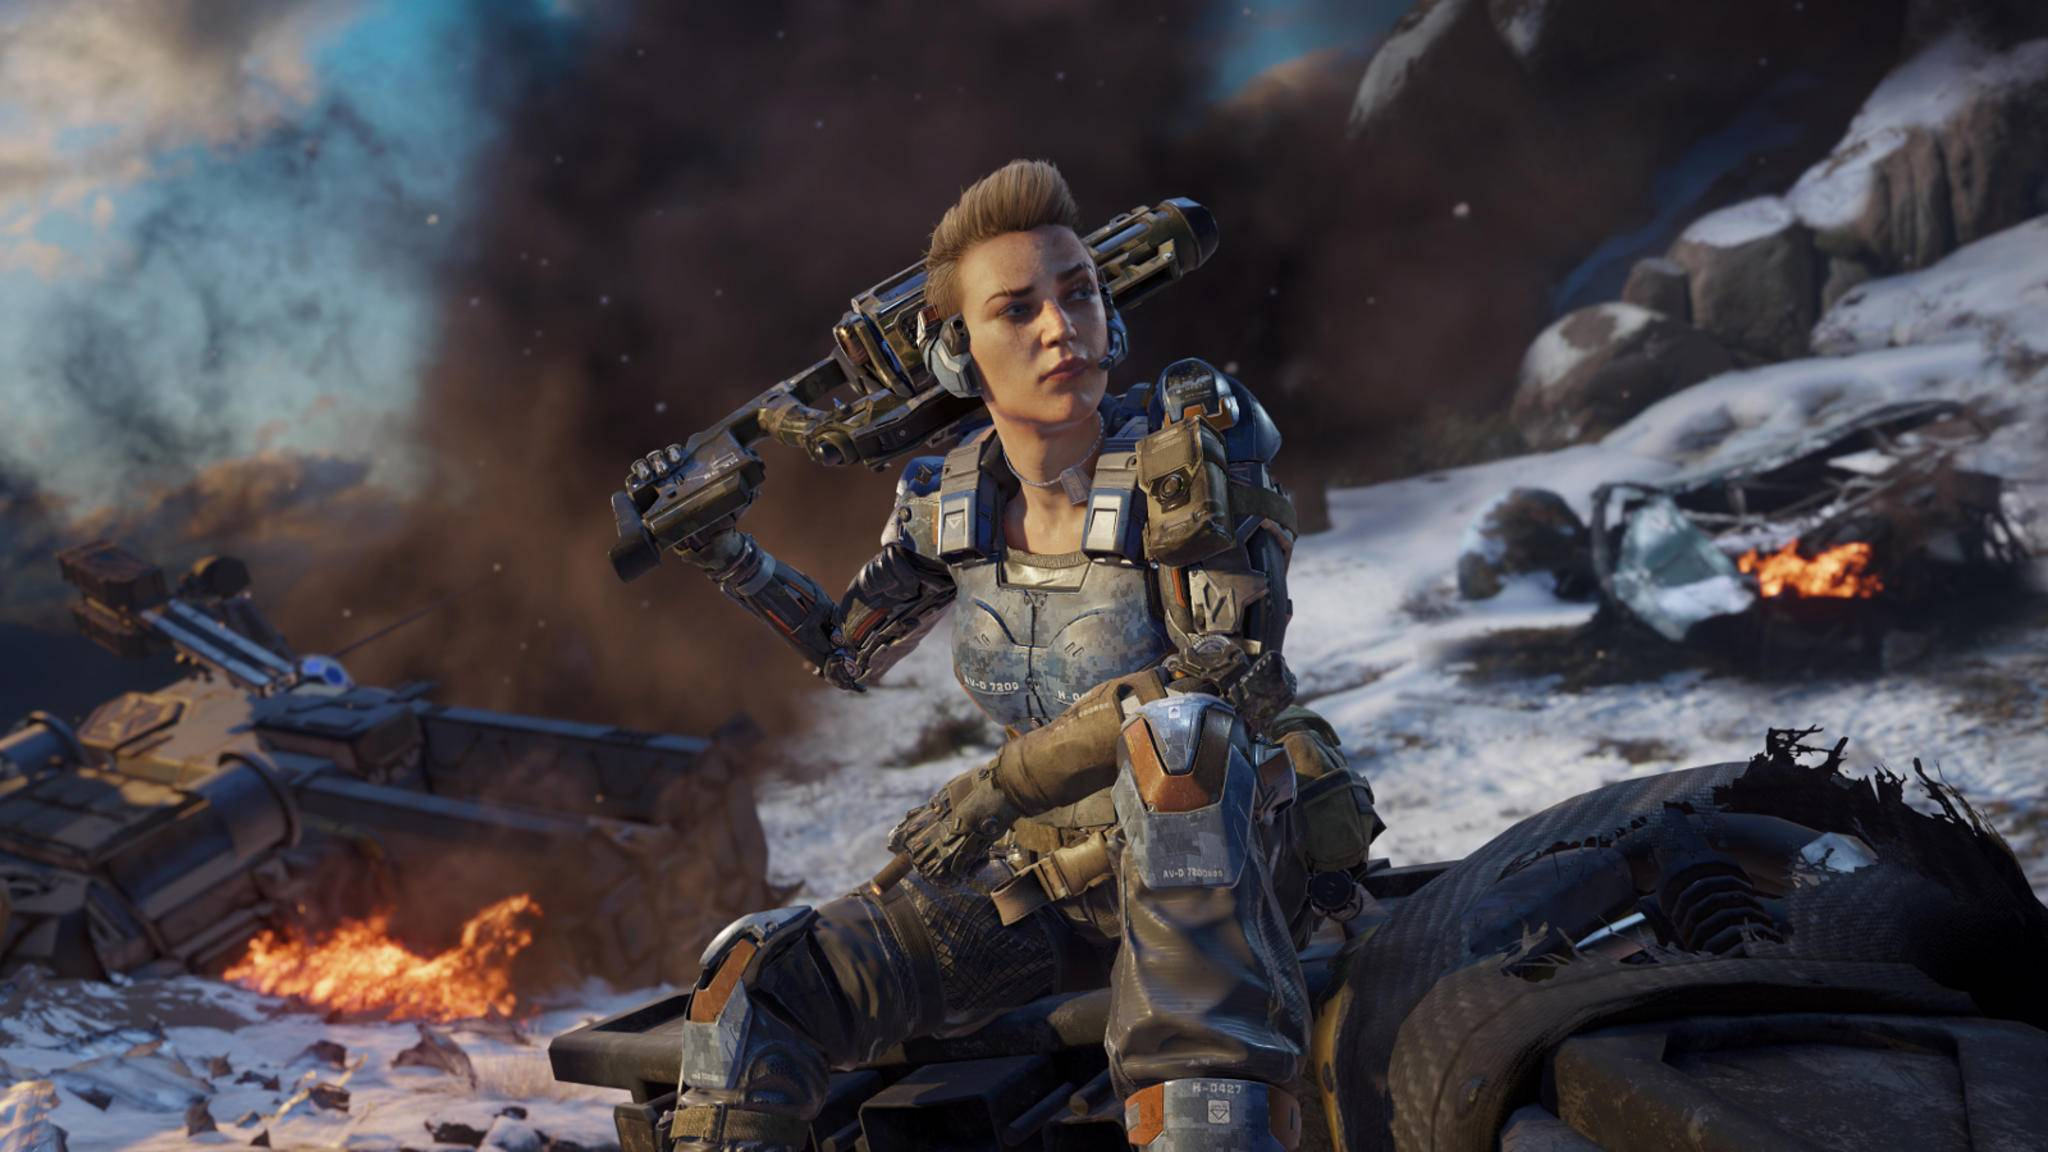 Call of Duty Black Ops 4: Logo auf einer Baseballkappe entdeckt